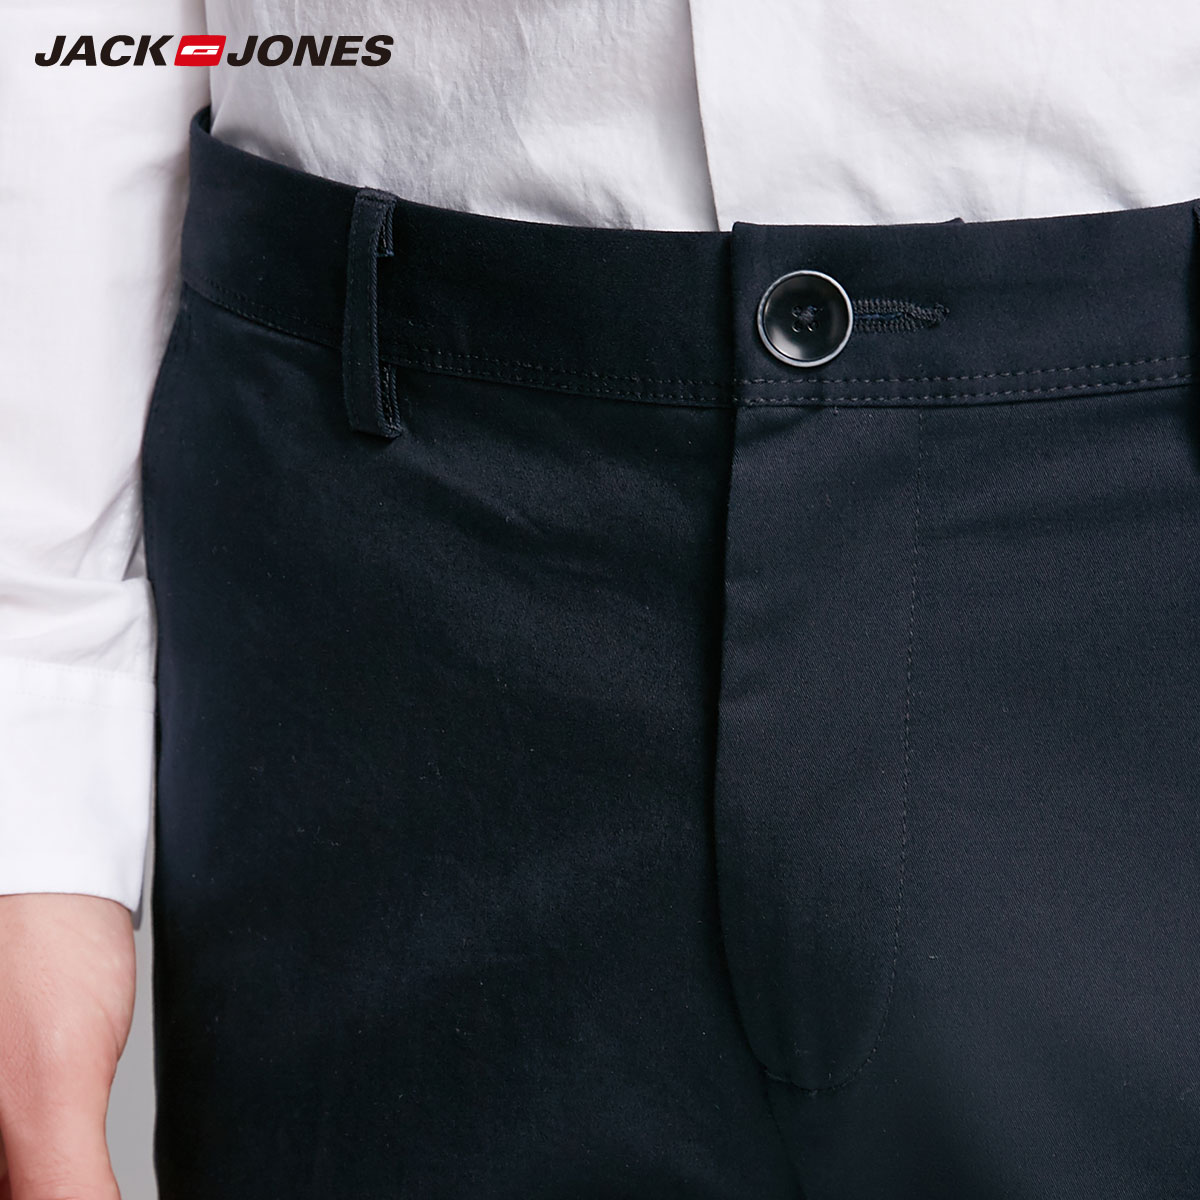 Image 4 - JackJones Mens Cotton Pants Elastic Fabric Comfort Breathable  Business Smart Casual Pants Slim Fit Trousers Menswear218314502Casual  Pants